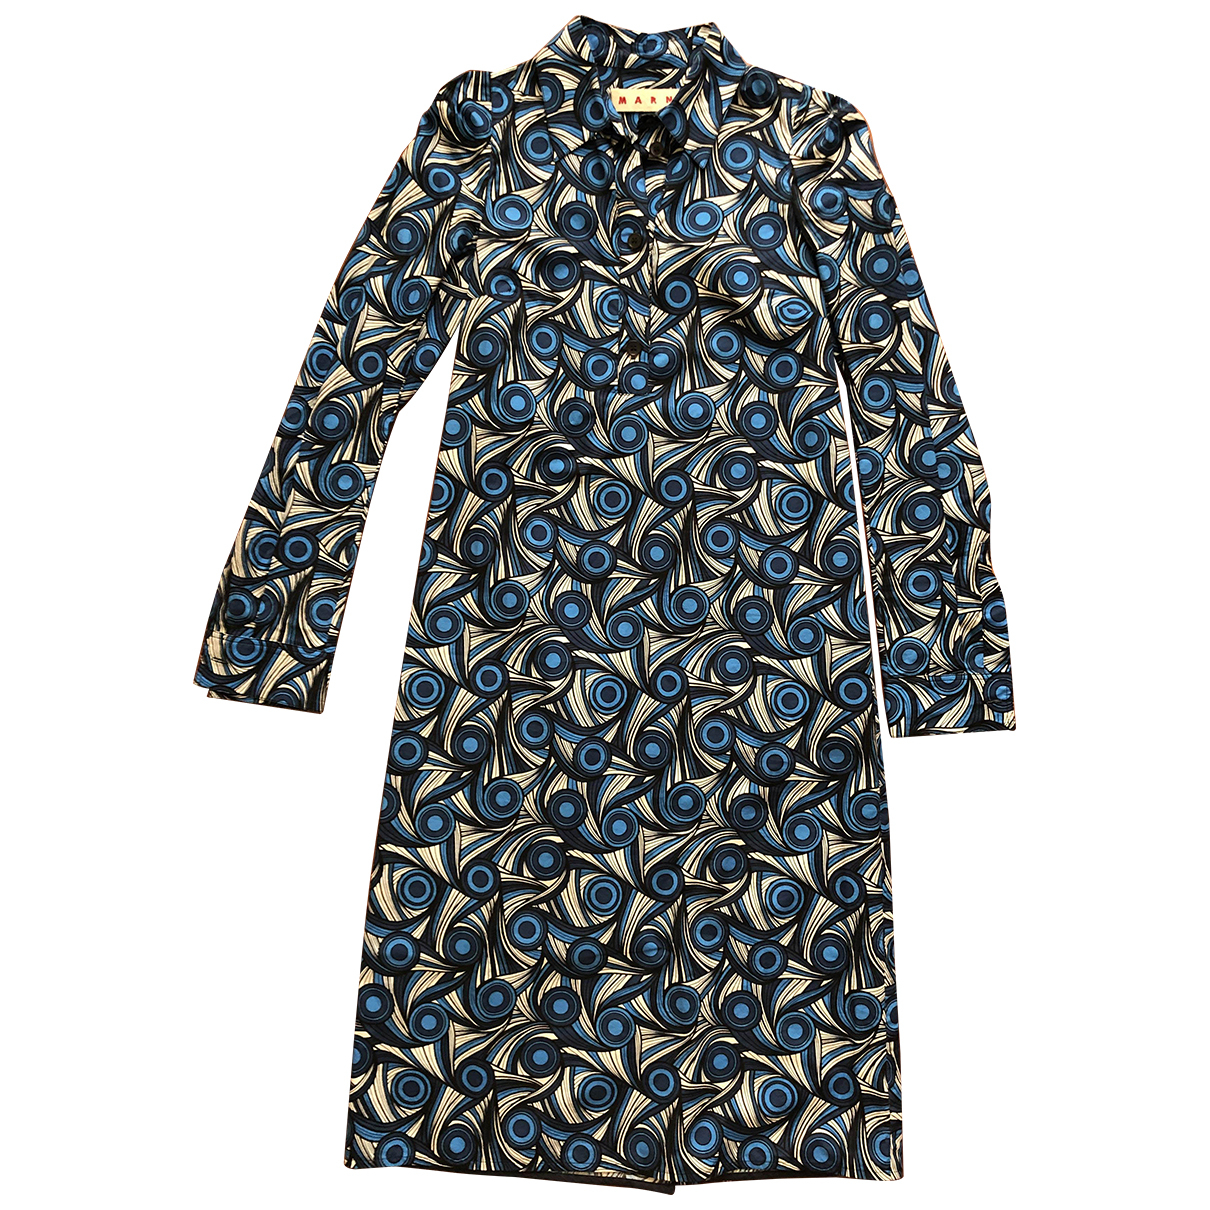 Marni \N Blue Cotton dress for Women 40 IT